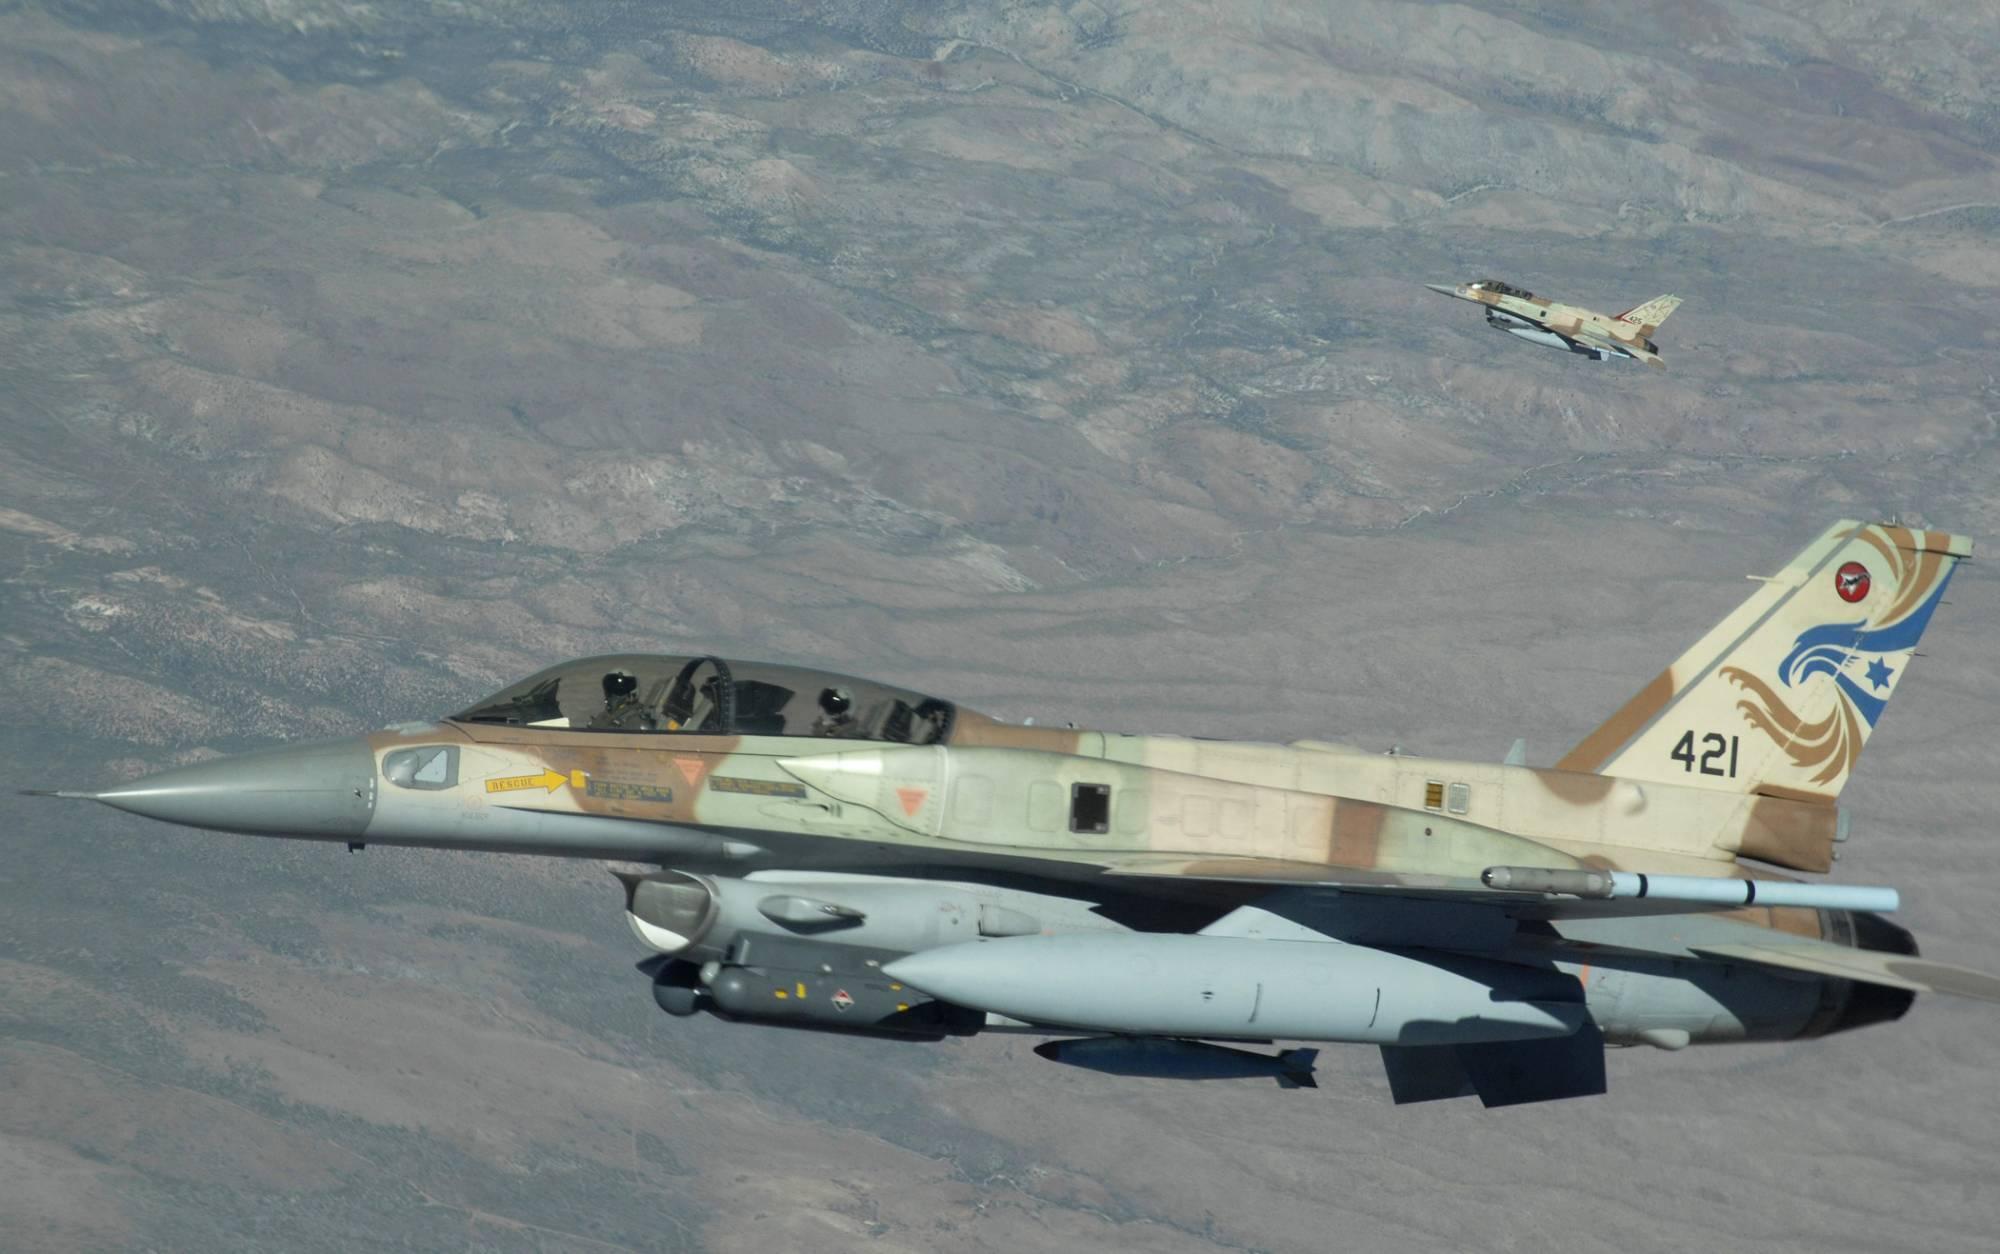 Report: Russia Blocked Israeli Overflight of Syria, Lebanon